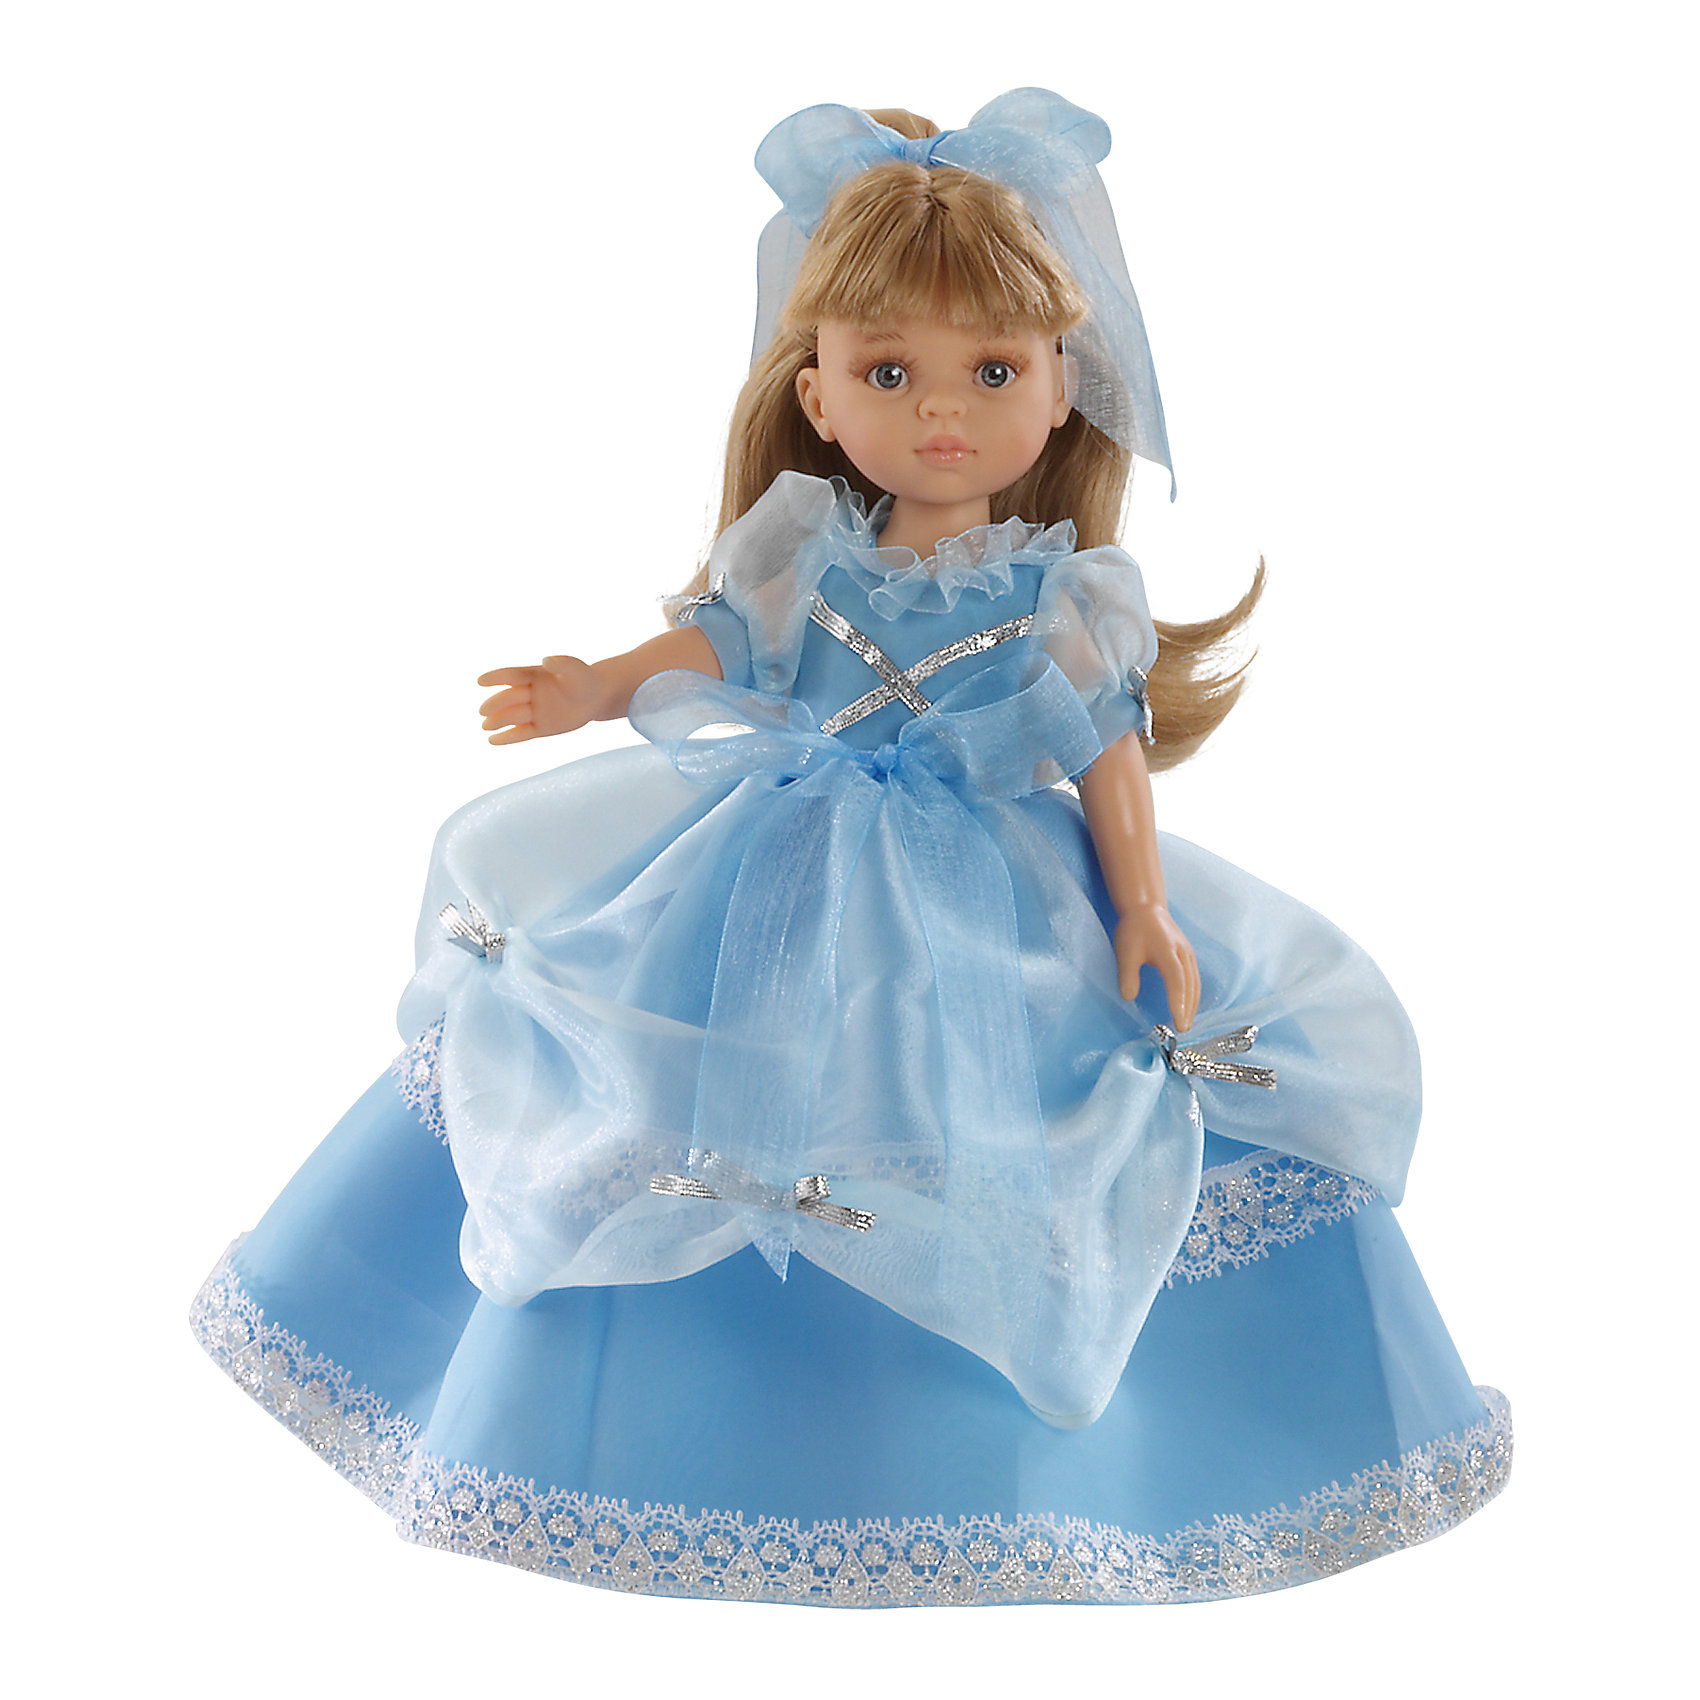 Paola Reina Кукла Карла принцесса, 32см, Paola Reina paola reina кукла кэрол 32 см paola reina